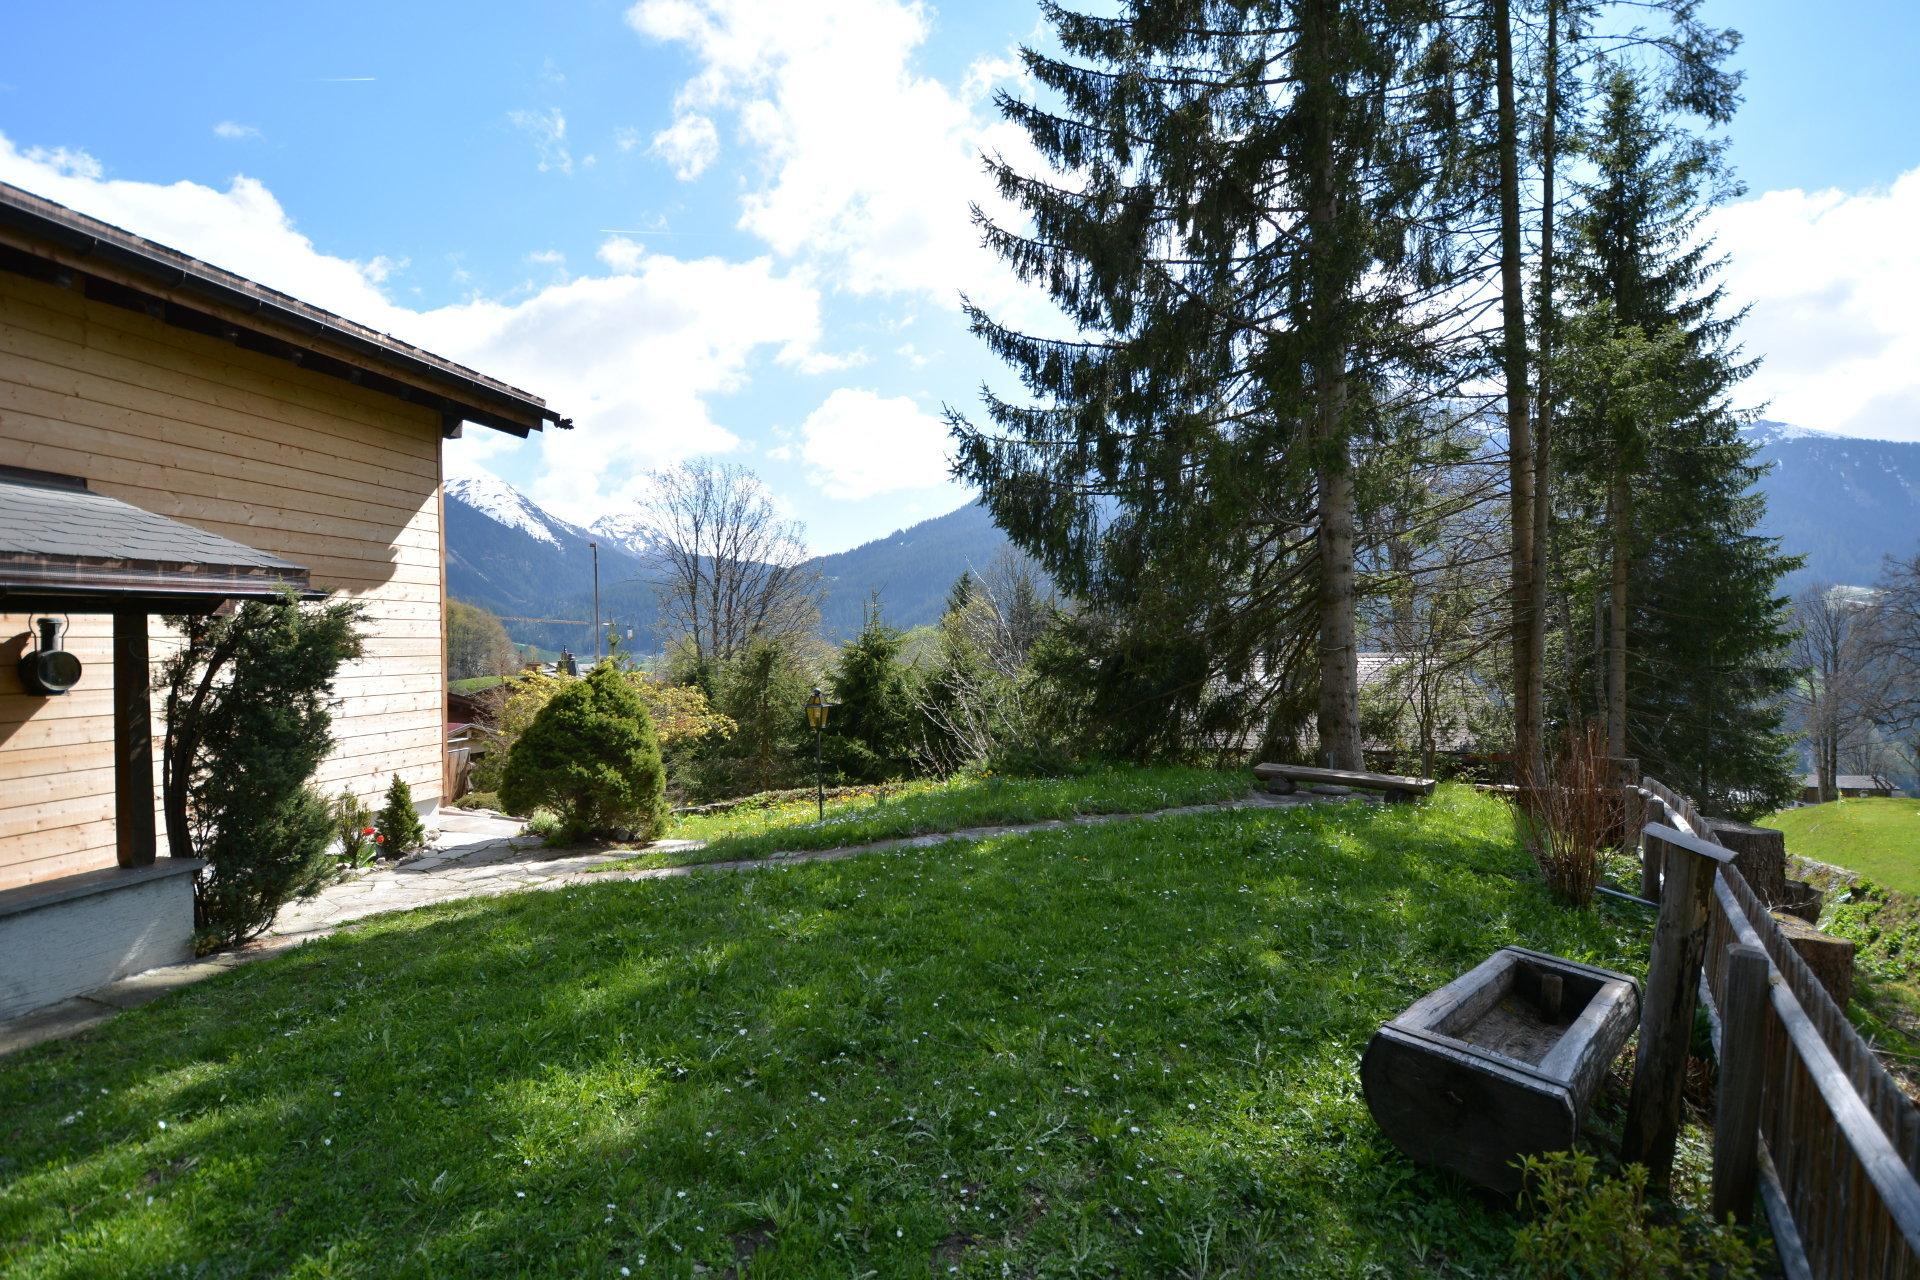 Chalet-Fuechsli-Klosters-Sommer-4.JPG